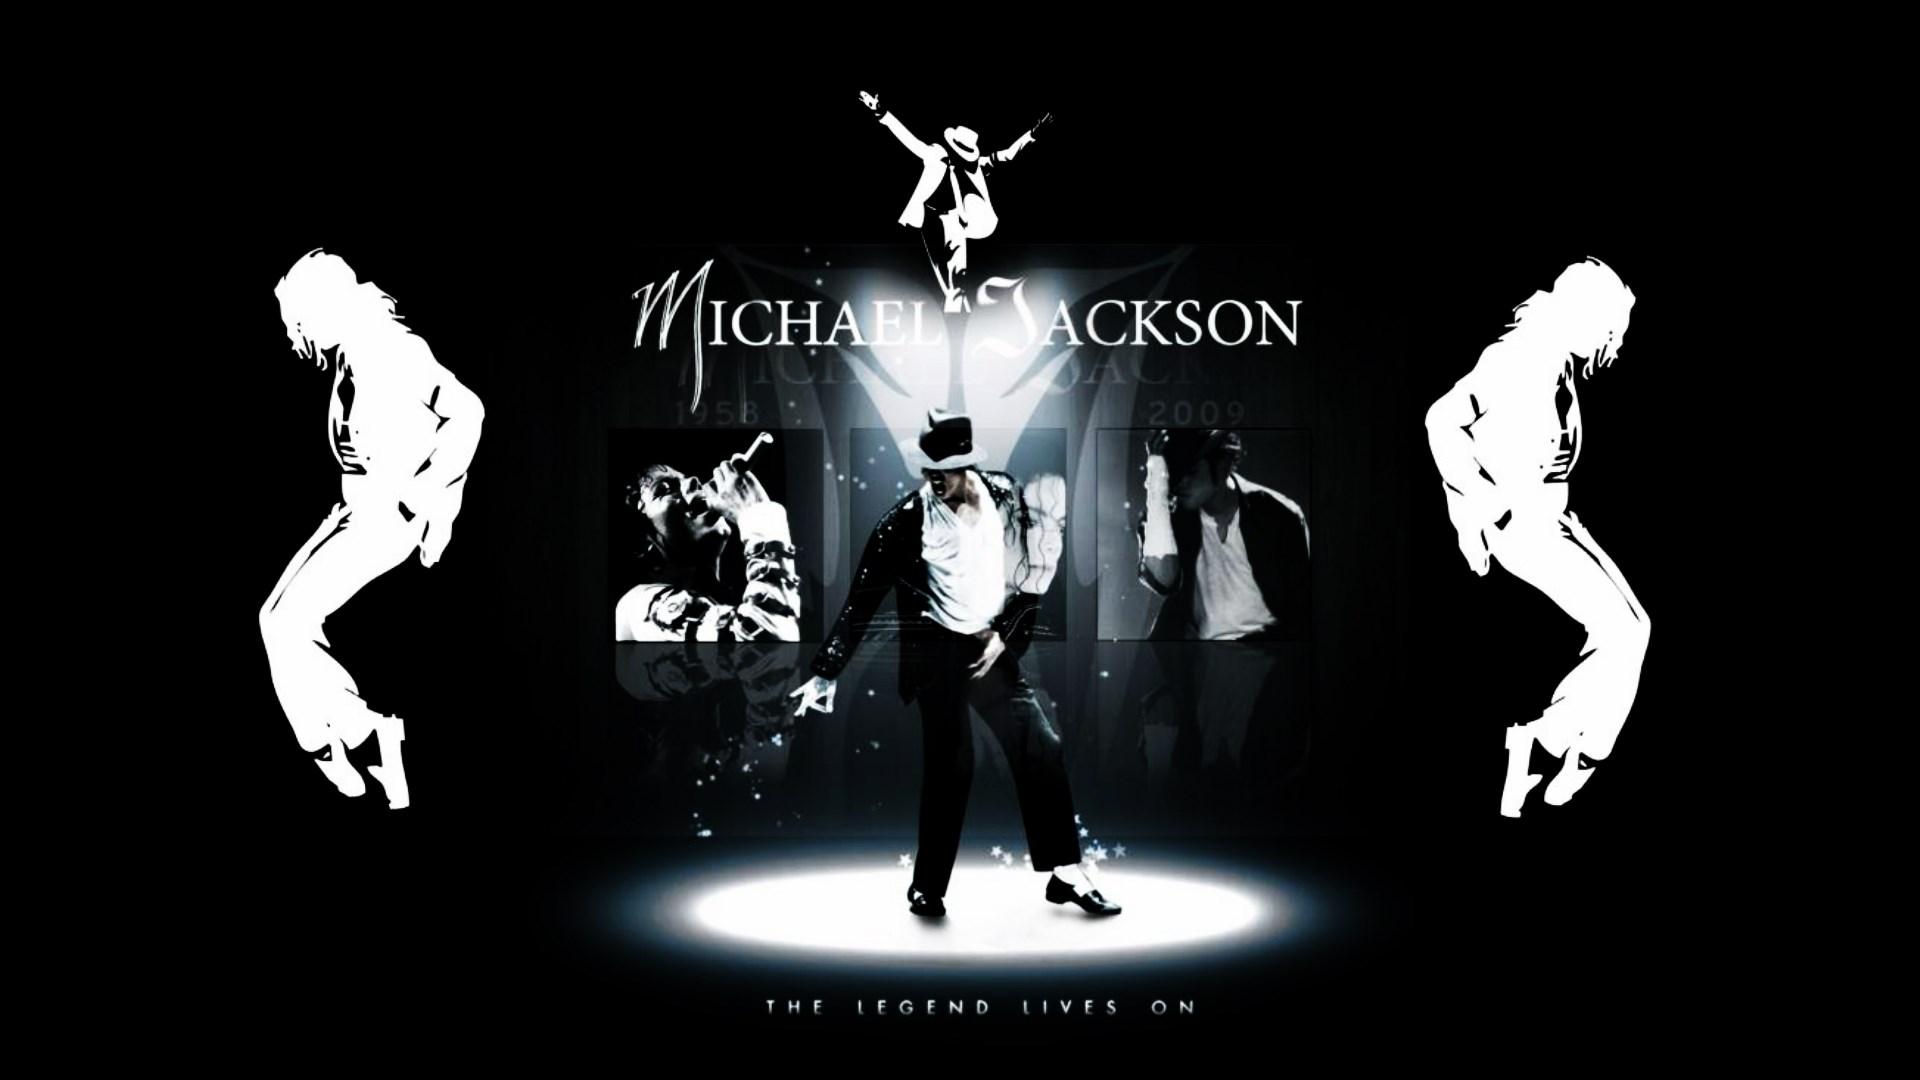 19201080 Free Screensaver For Michael Jackson Wallpaper